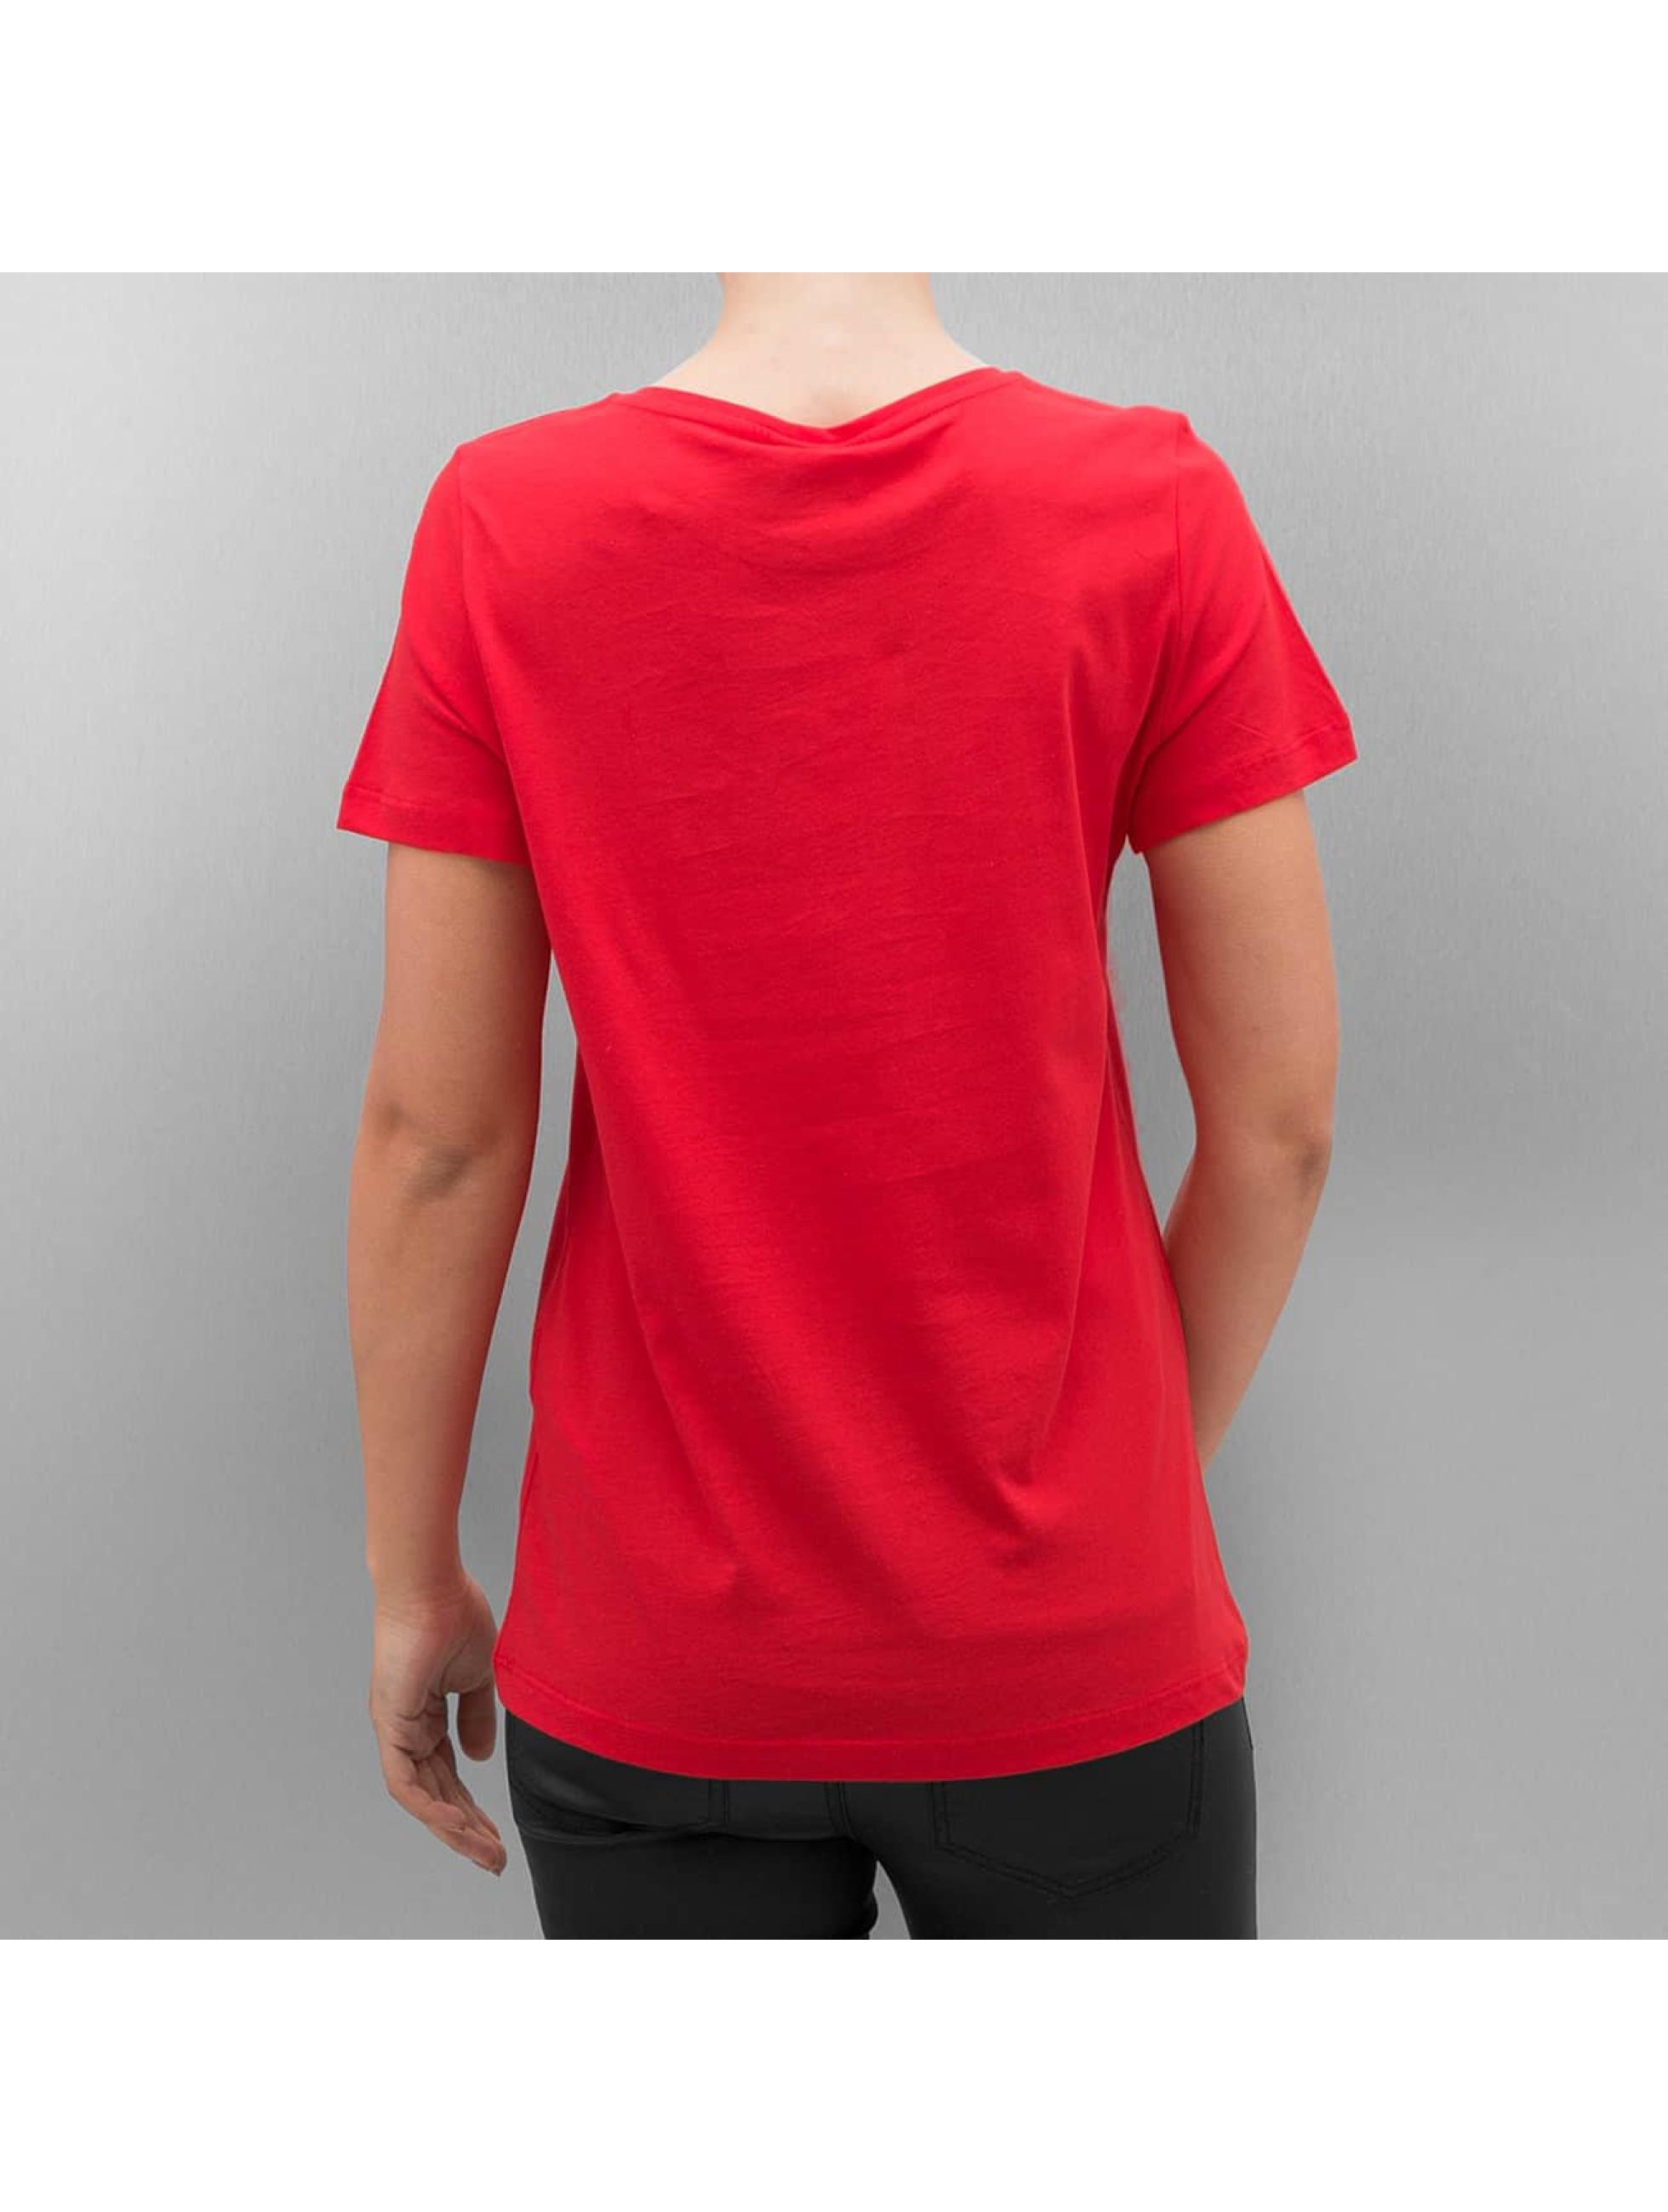 Vero Moda Camiseta VmMy Christmas rojo